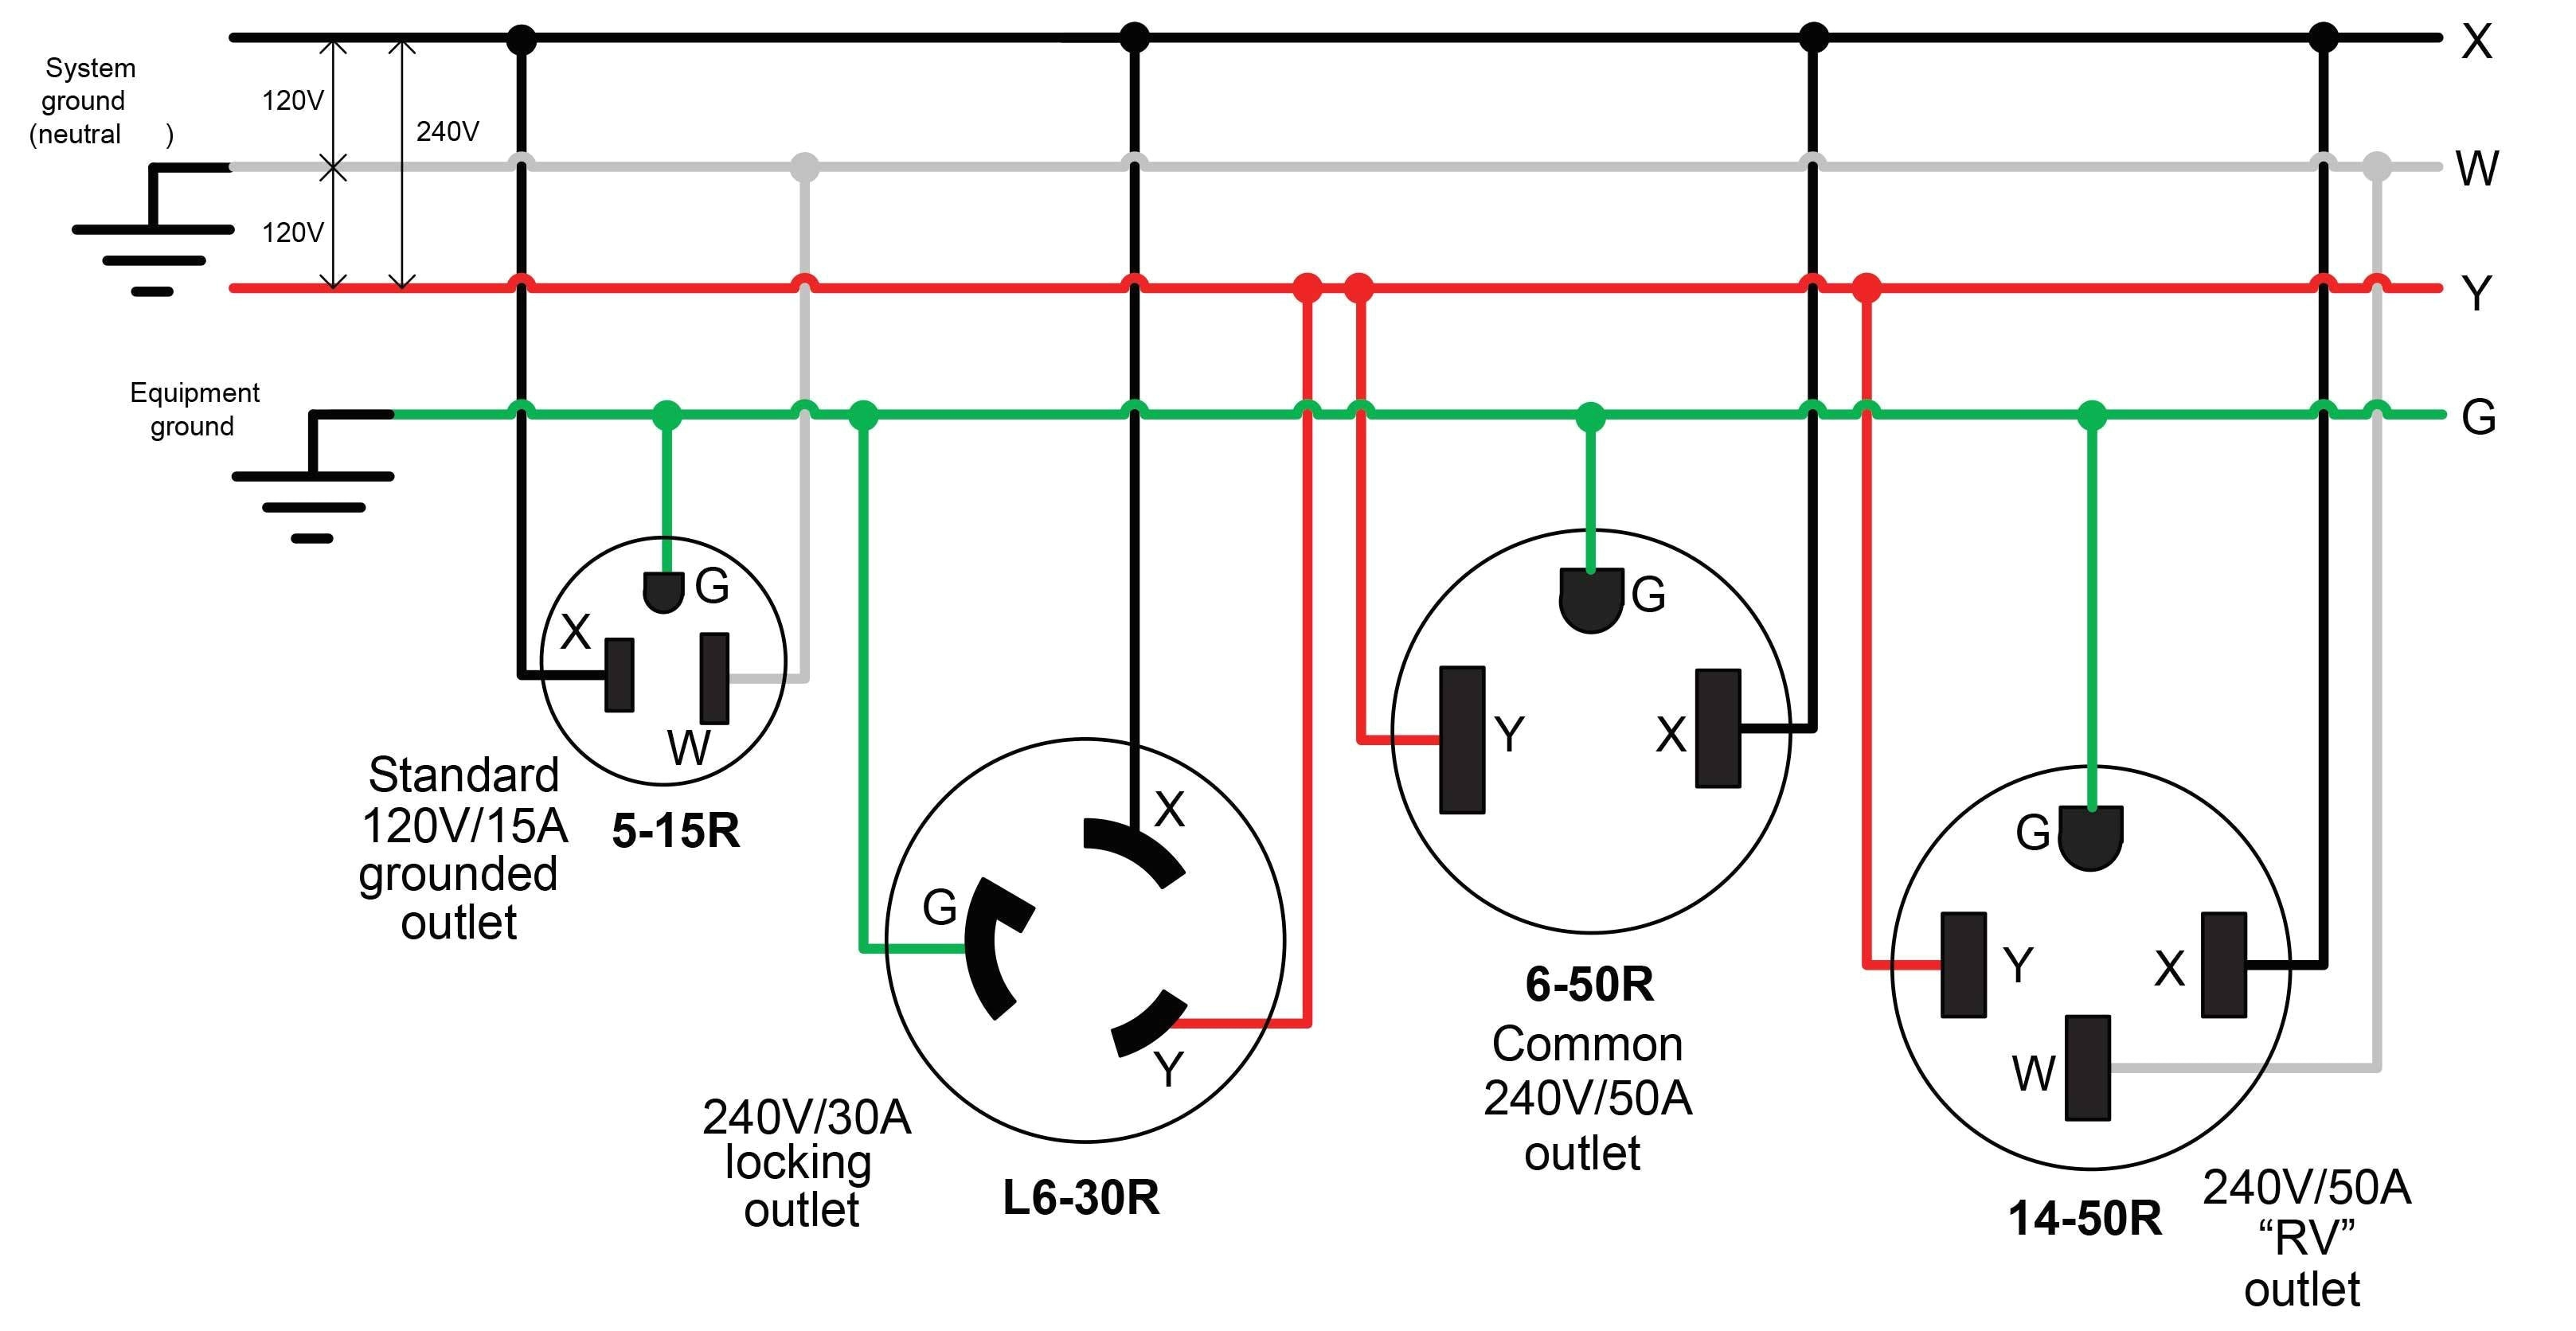 Nema L6 20 Wiring Diagram 2008 Chevy Aveo Wiring Diagram Rainbowvacum Yenpancane Jeanjaures37 Fr